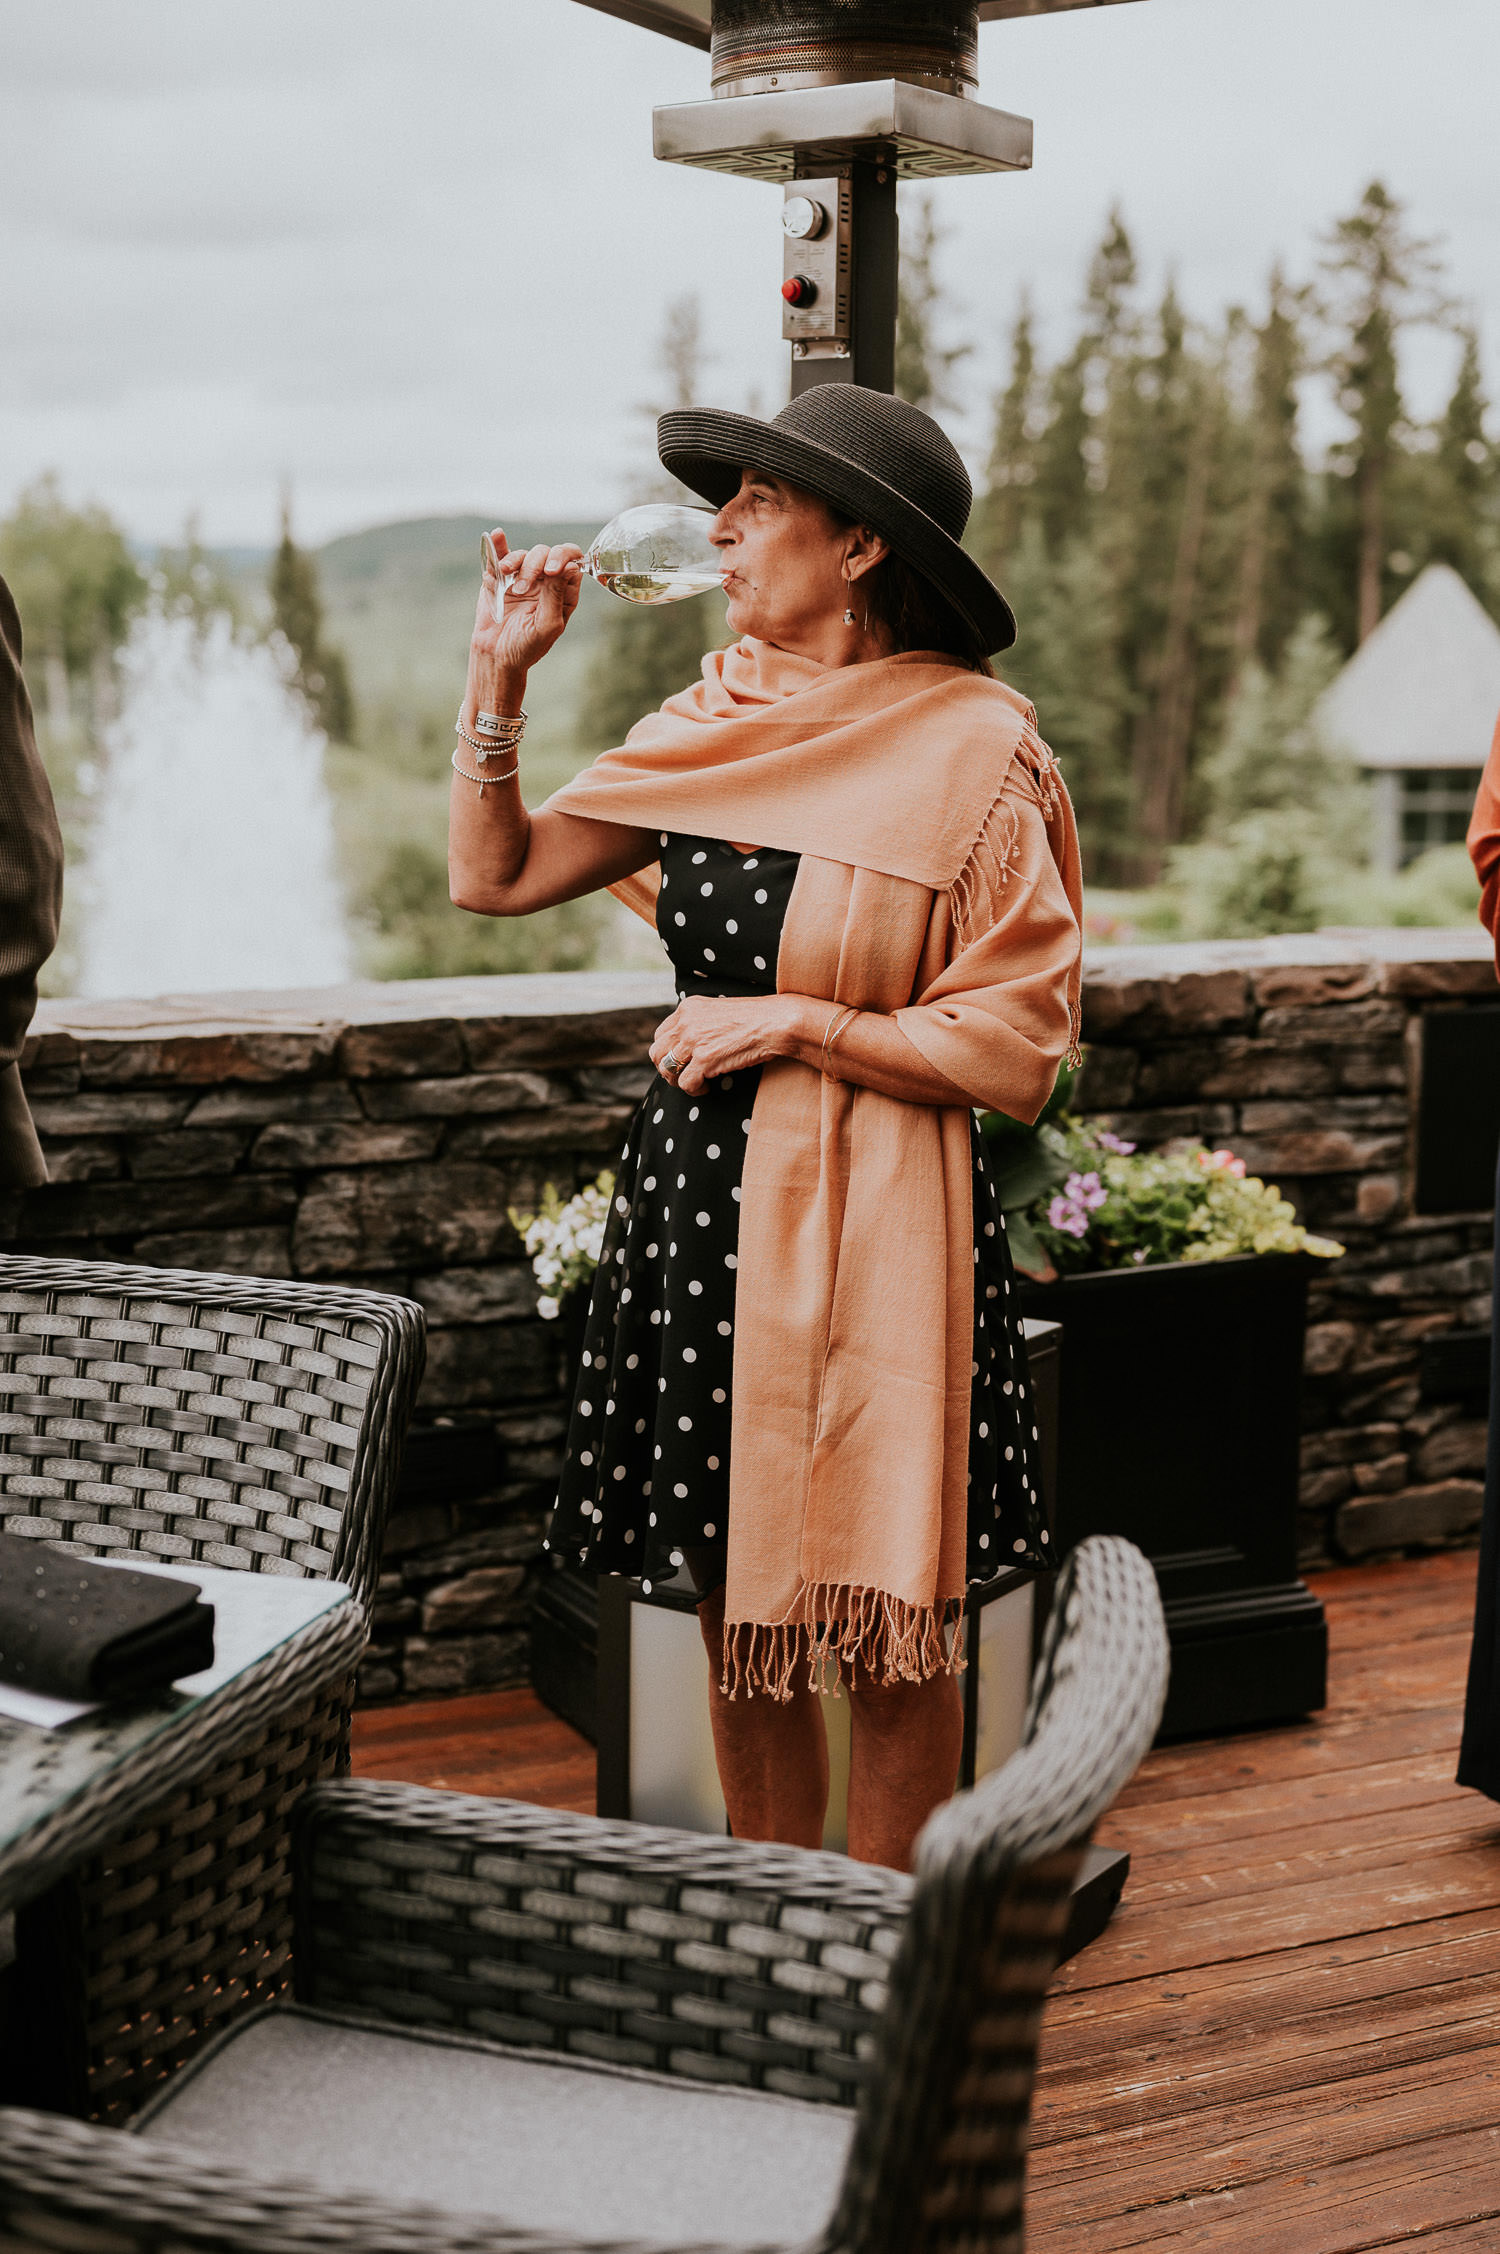 azuridge-estate-hotel-wedding-photographer-sarah-pukin-0190